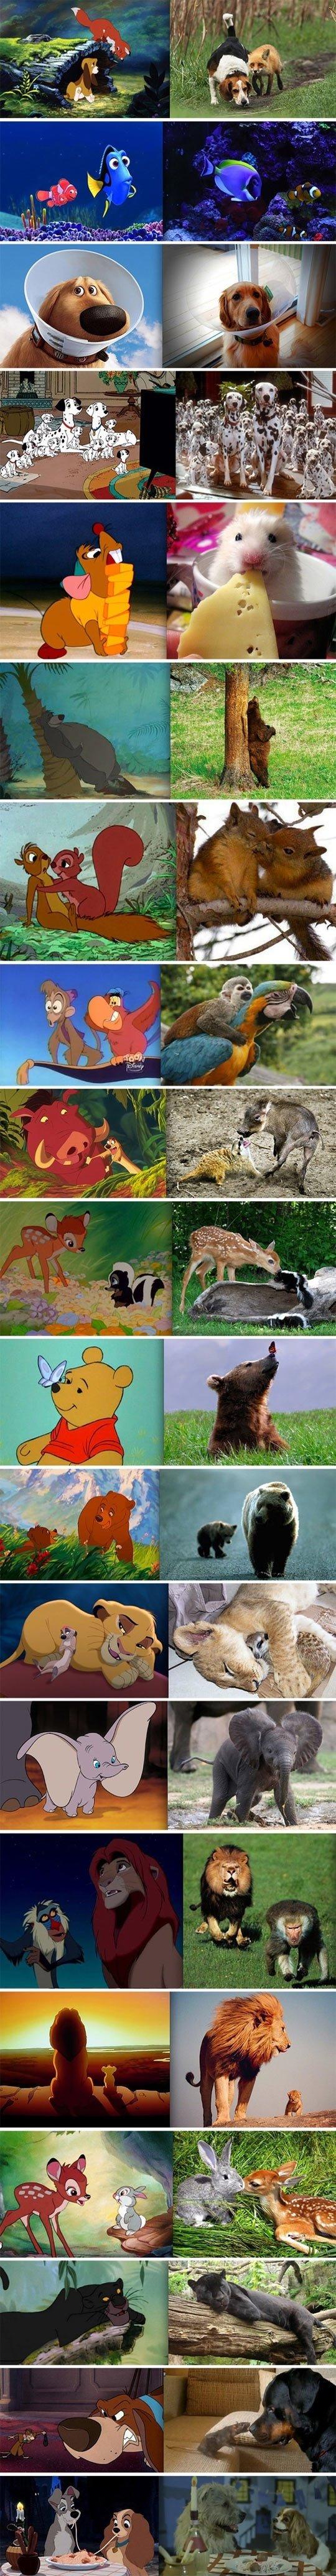 Disney animals in real life. .. why is Simba chasing Rafiki??? Disney animals in real life why is Simba chasing Rafiki???